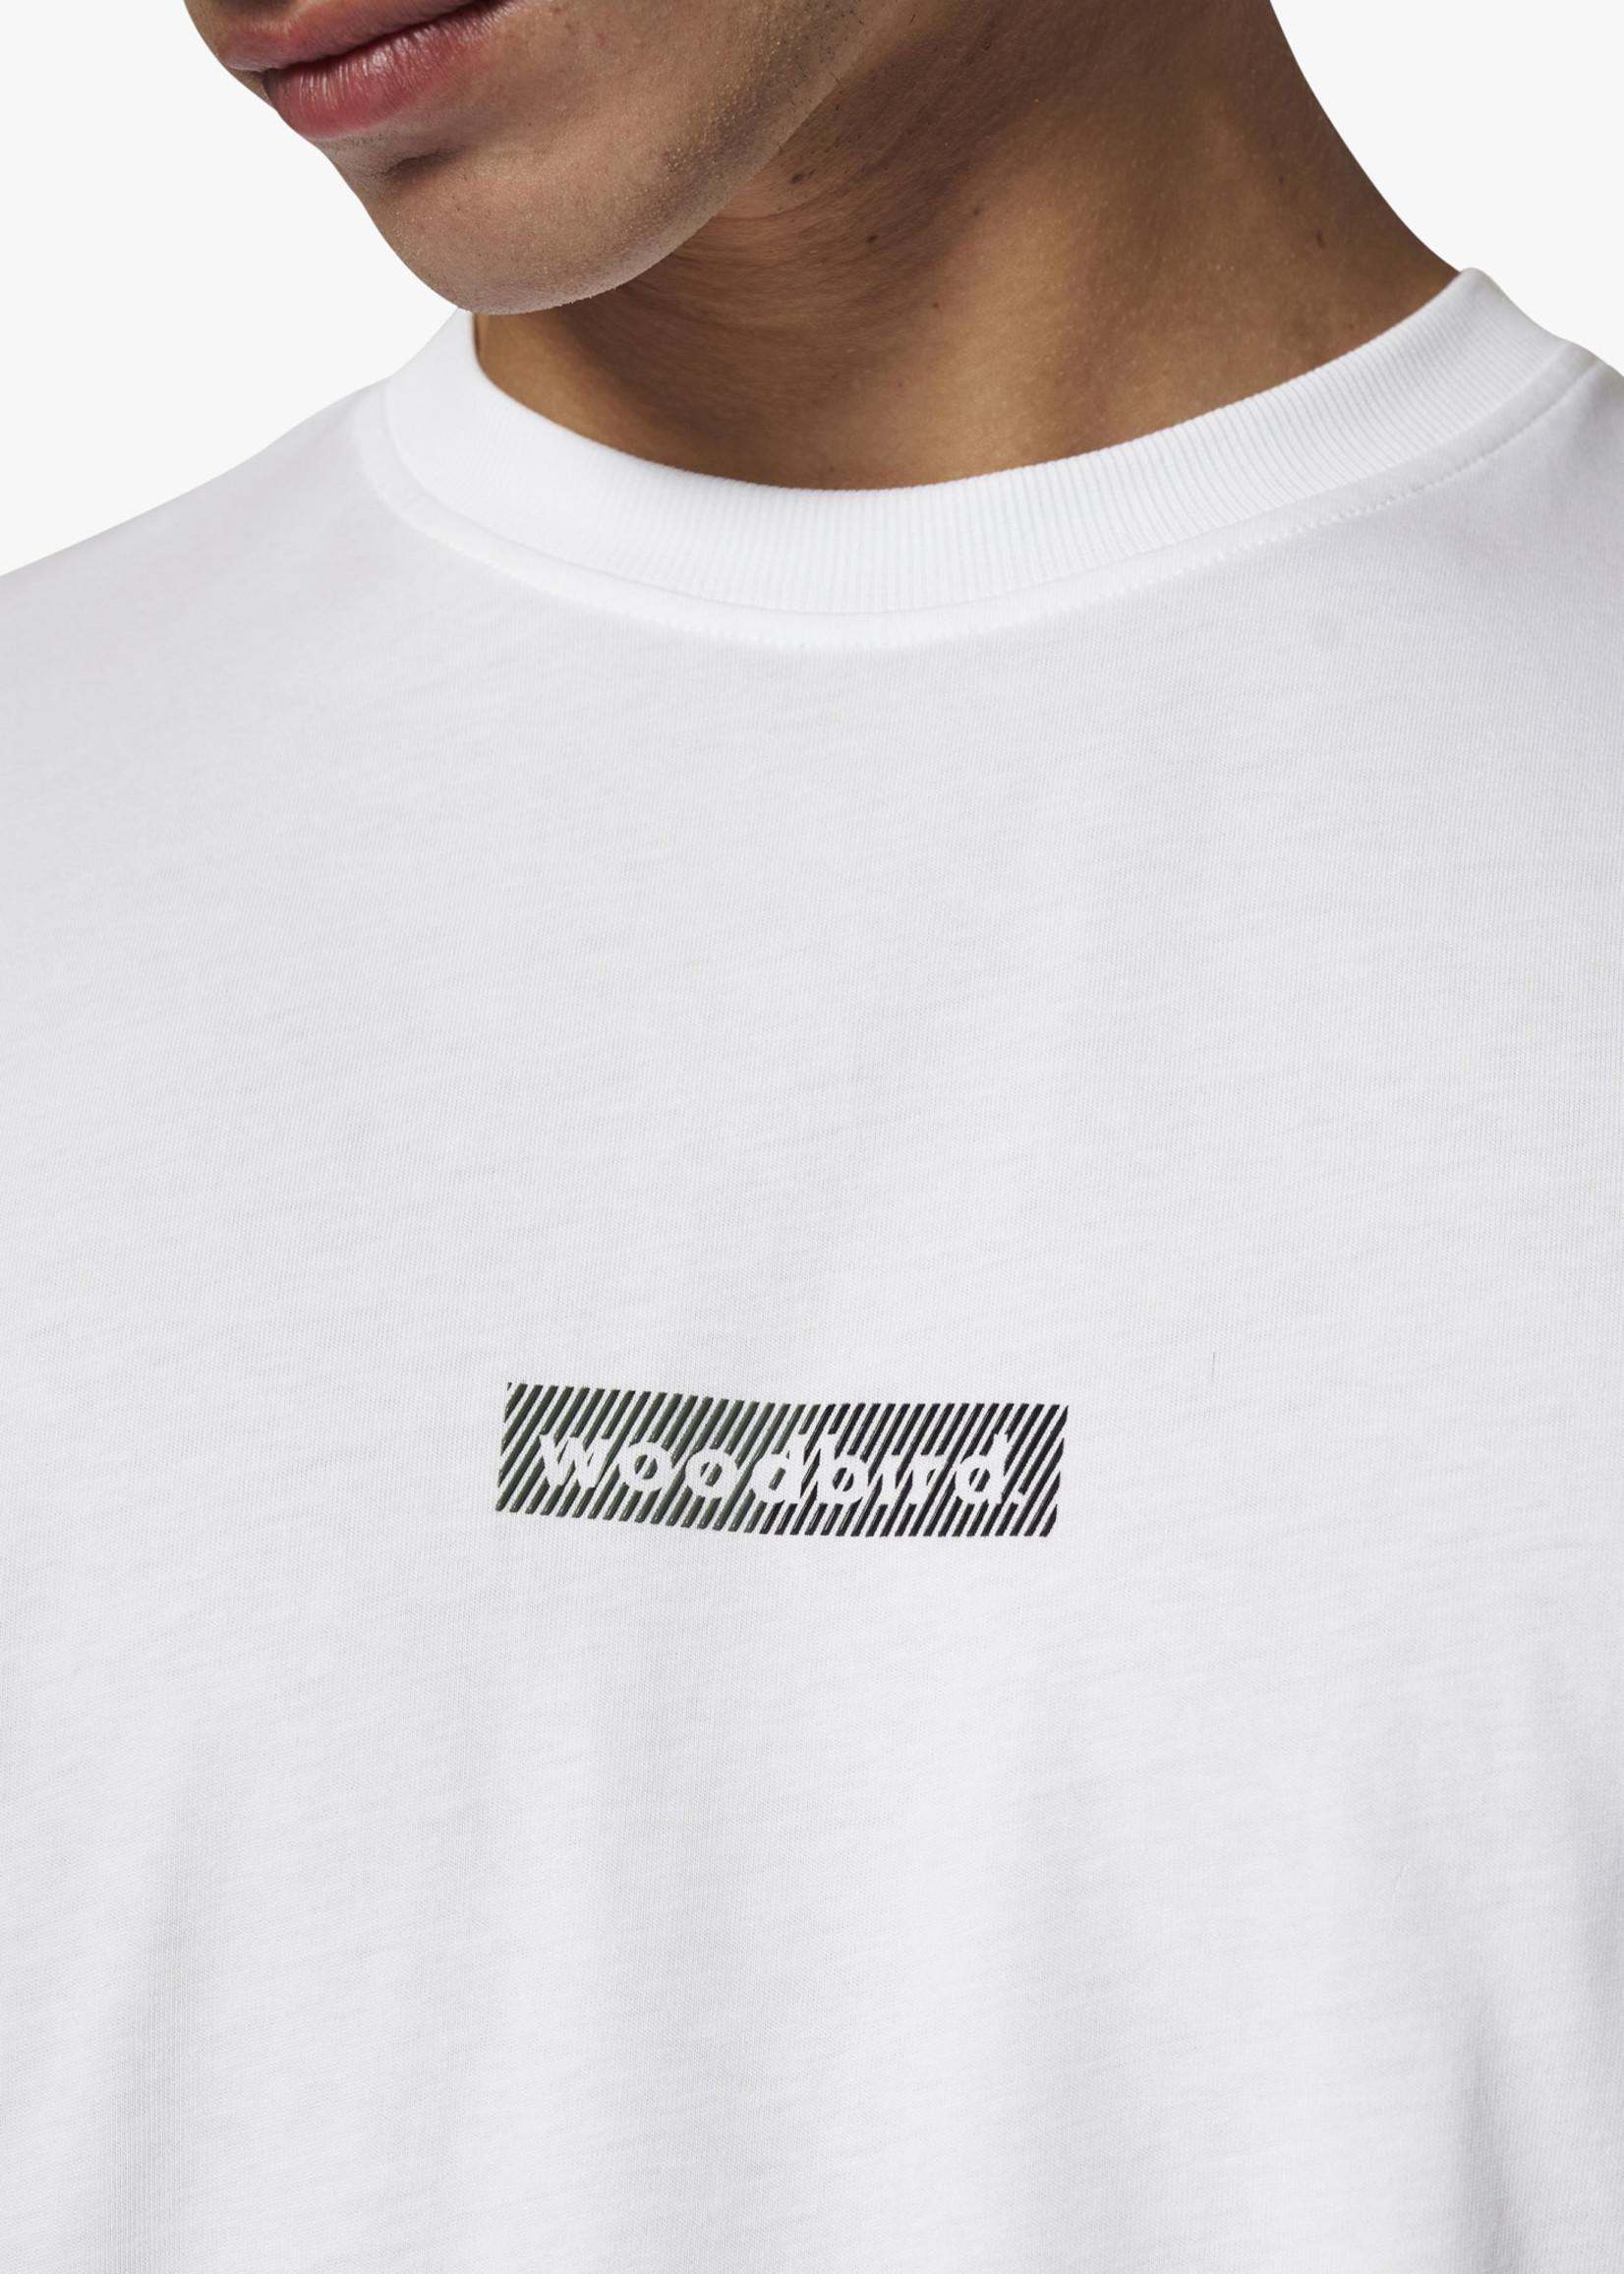 Woodbird Trope Split Tee